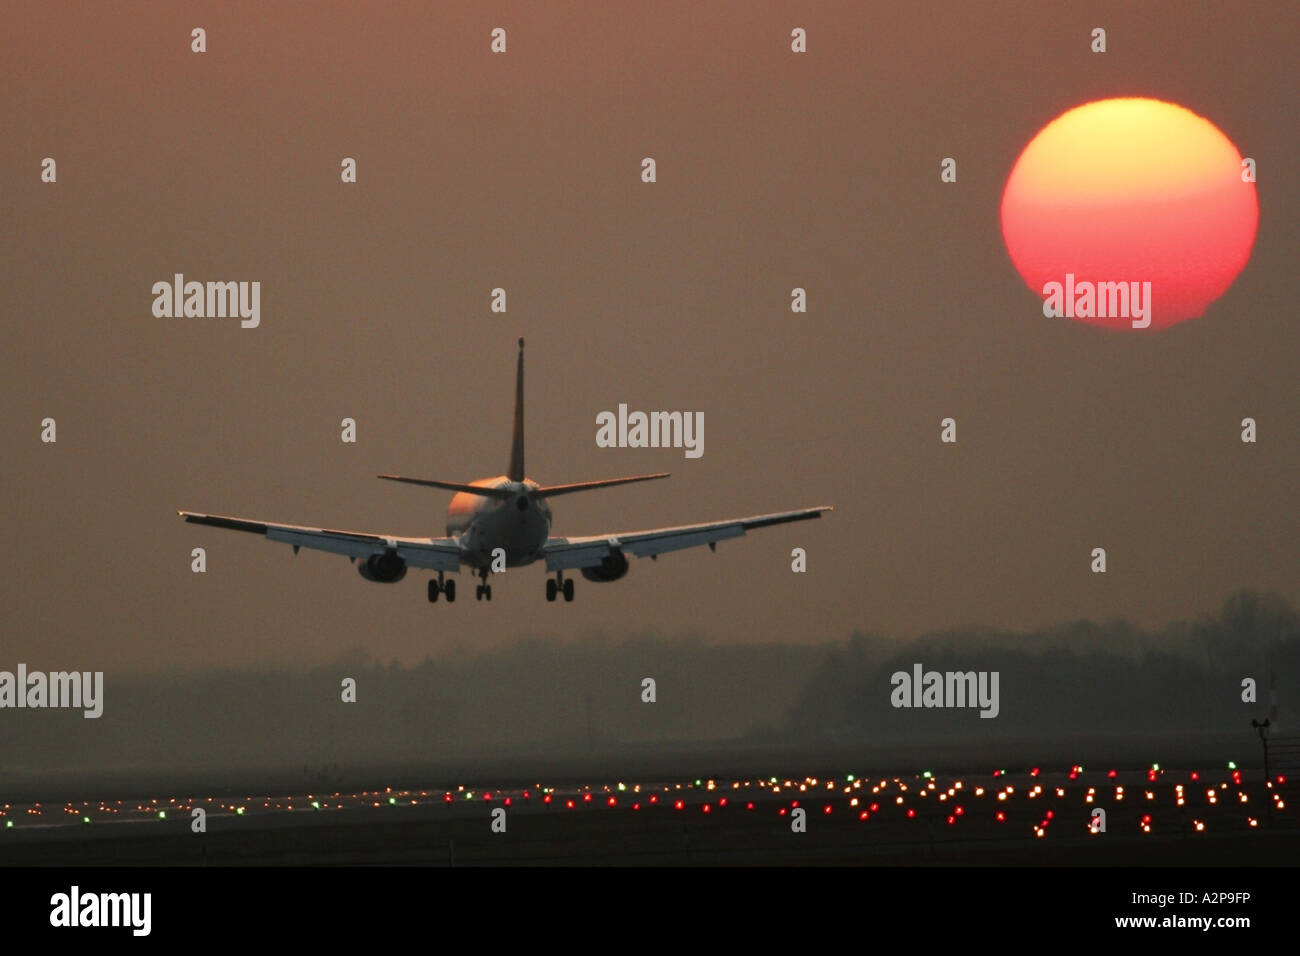 passenger airplane landing on airport Munich at sunset, Germany, Bavaria, Munich - Stock Image